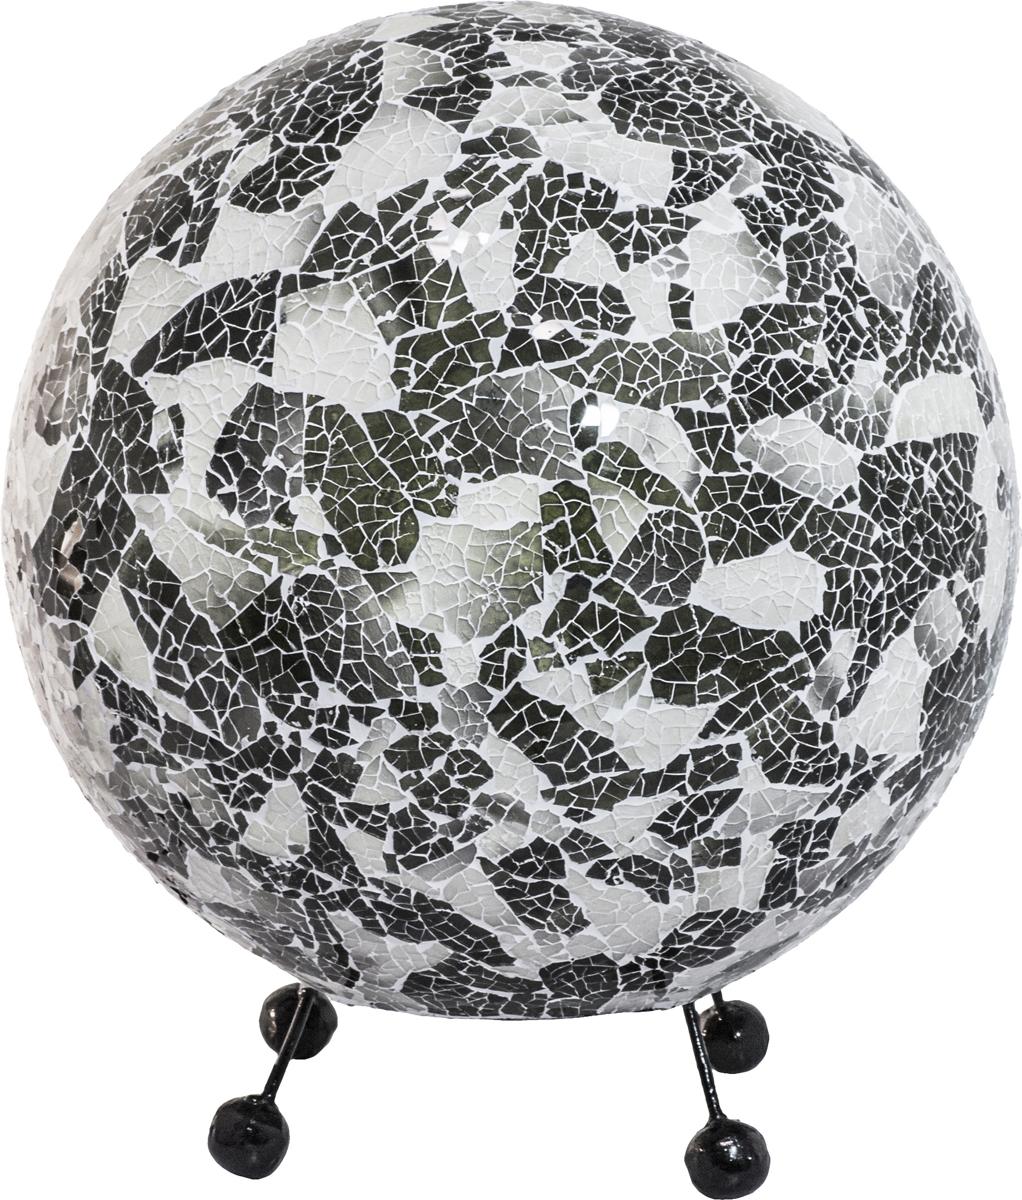 Лампа настольная Globo Bali. 25831 настольная лампа декоративная globo bali 25835